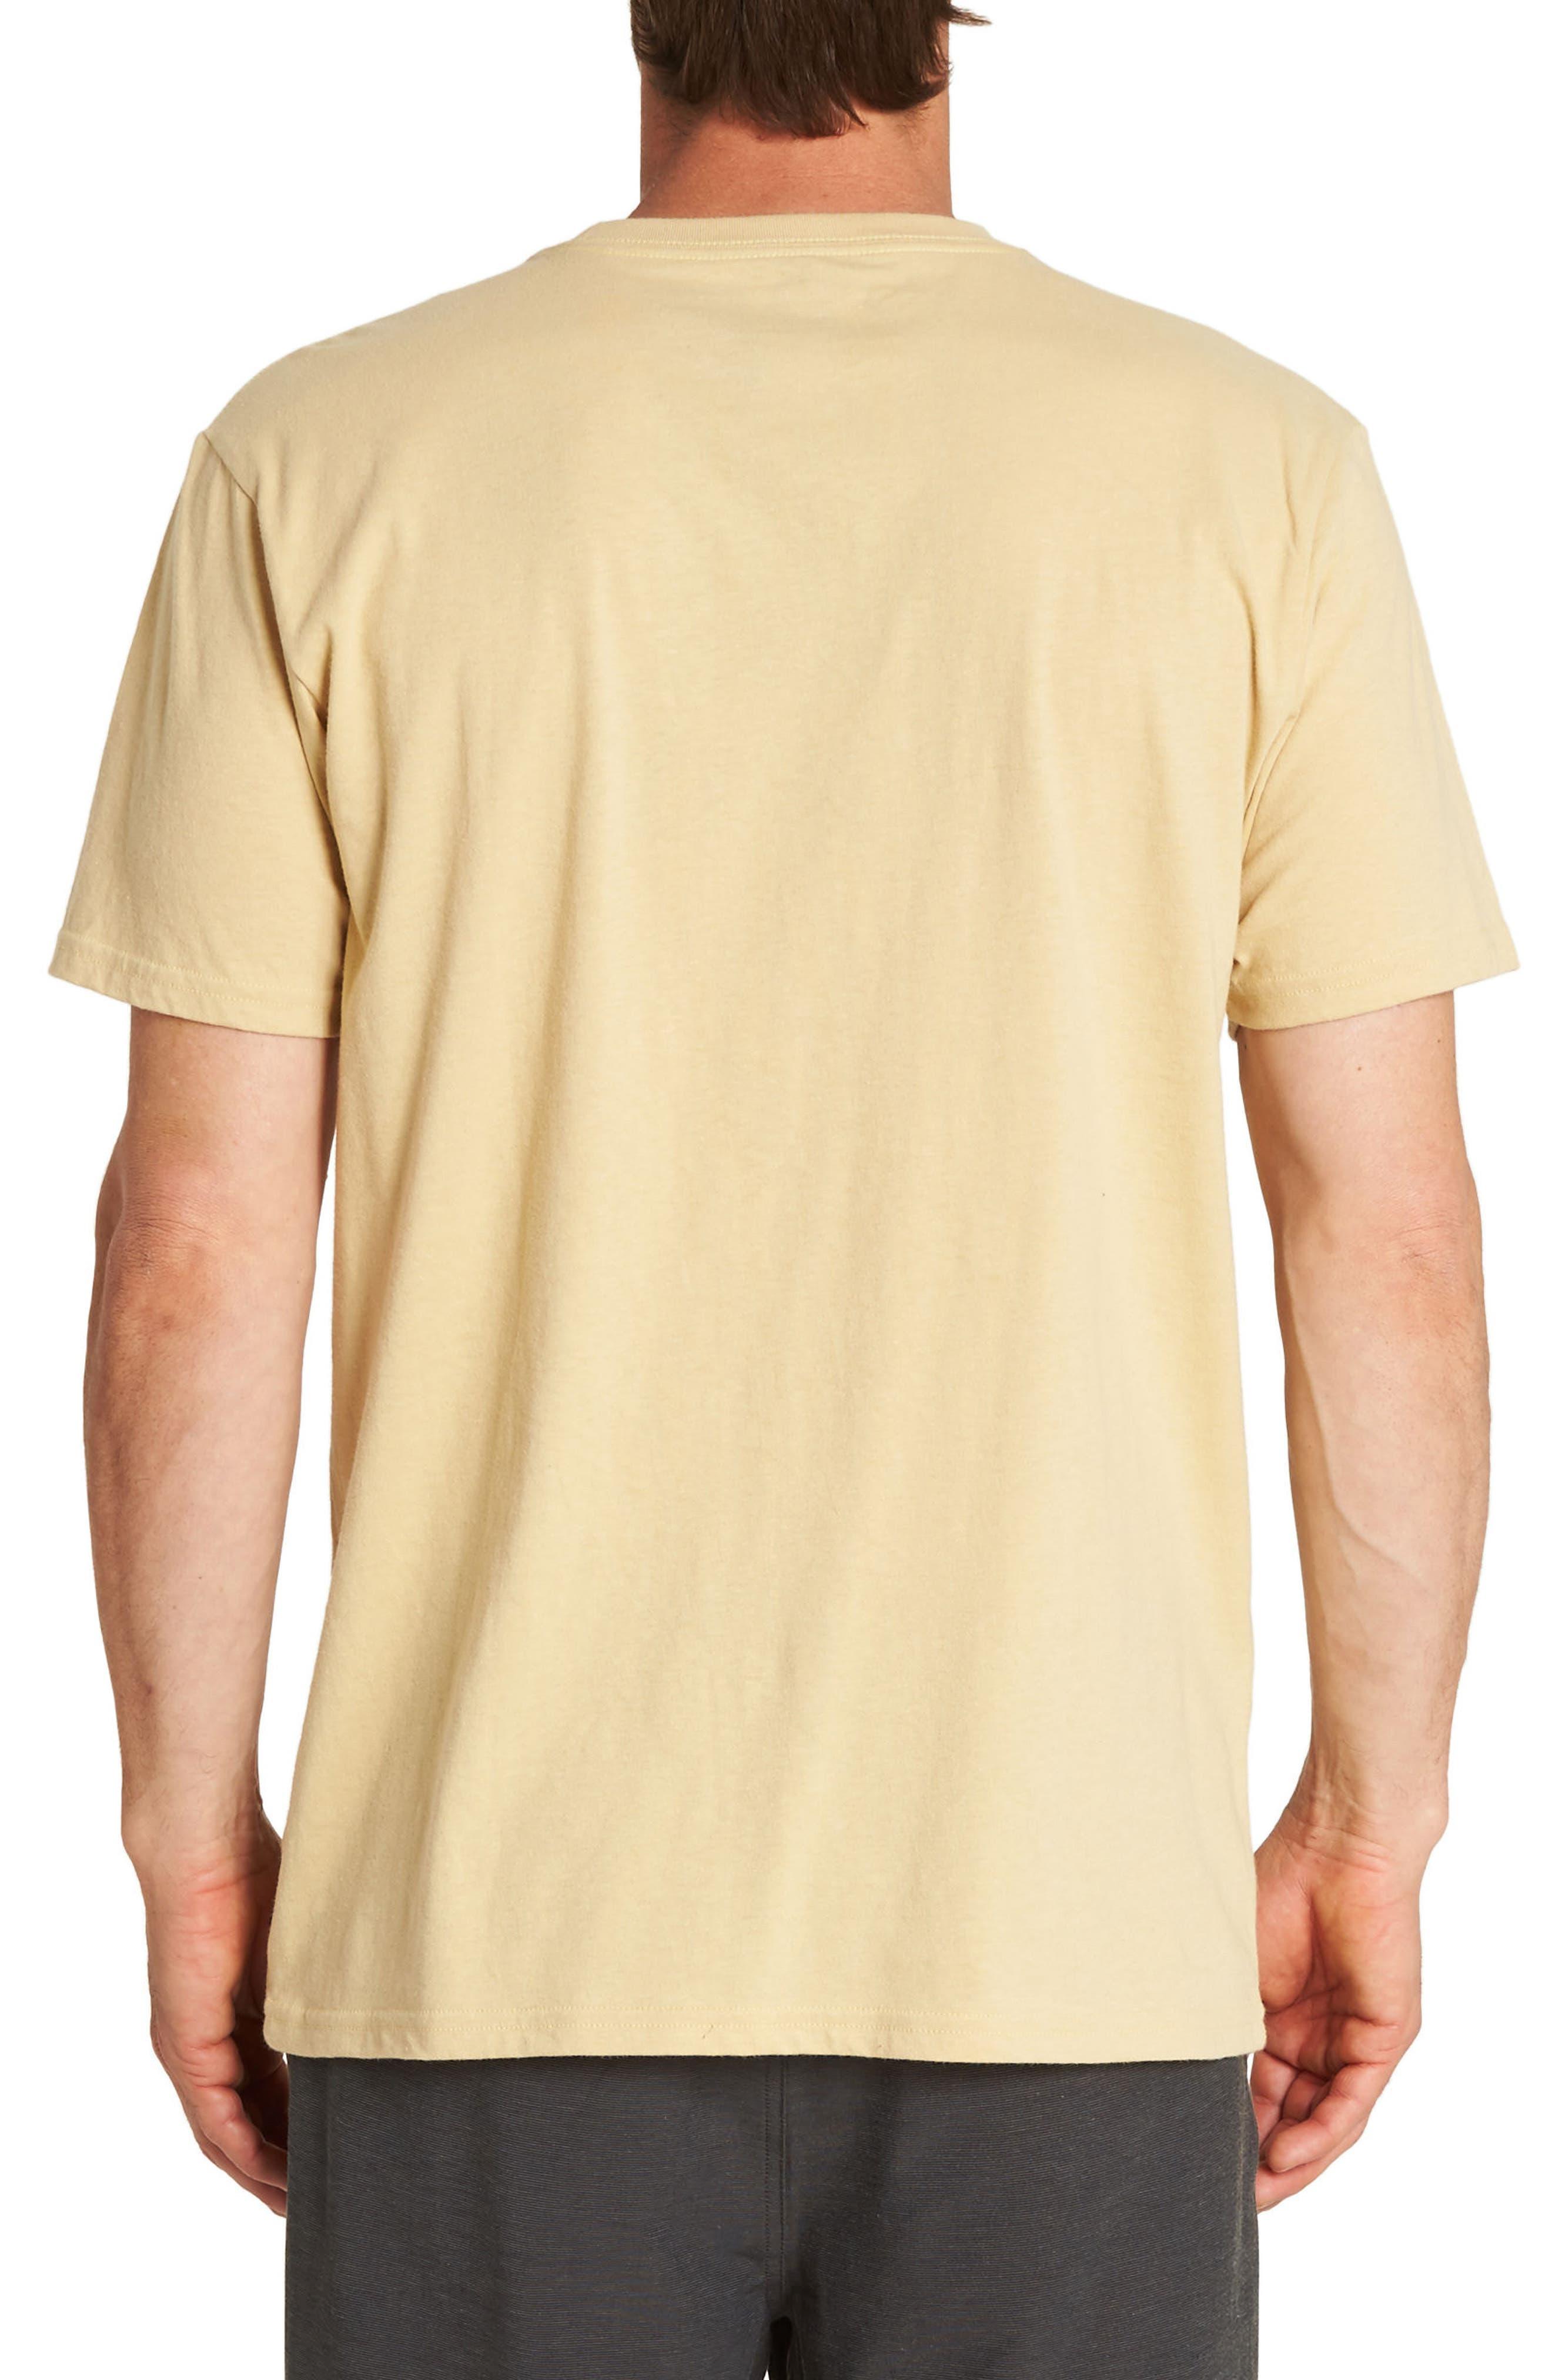 Team Print Pocket T-Shirt,                             Alternate thumbnail 2, color,                             250